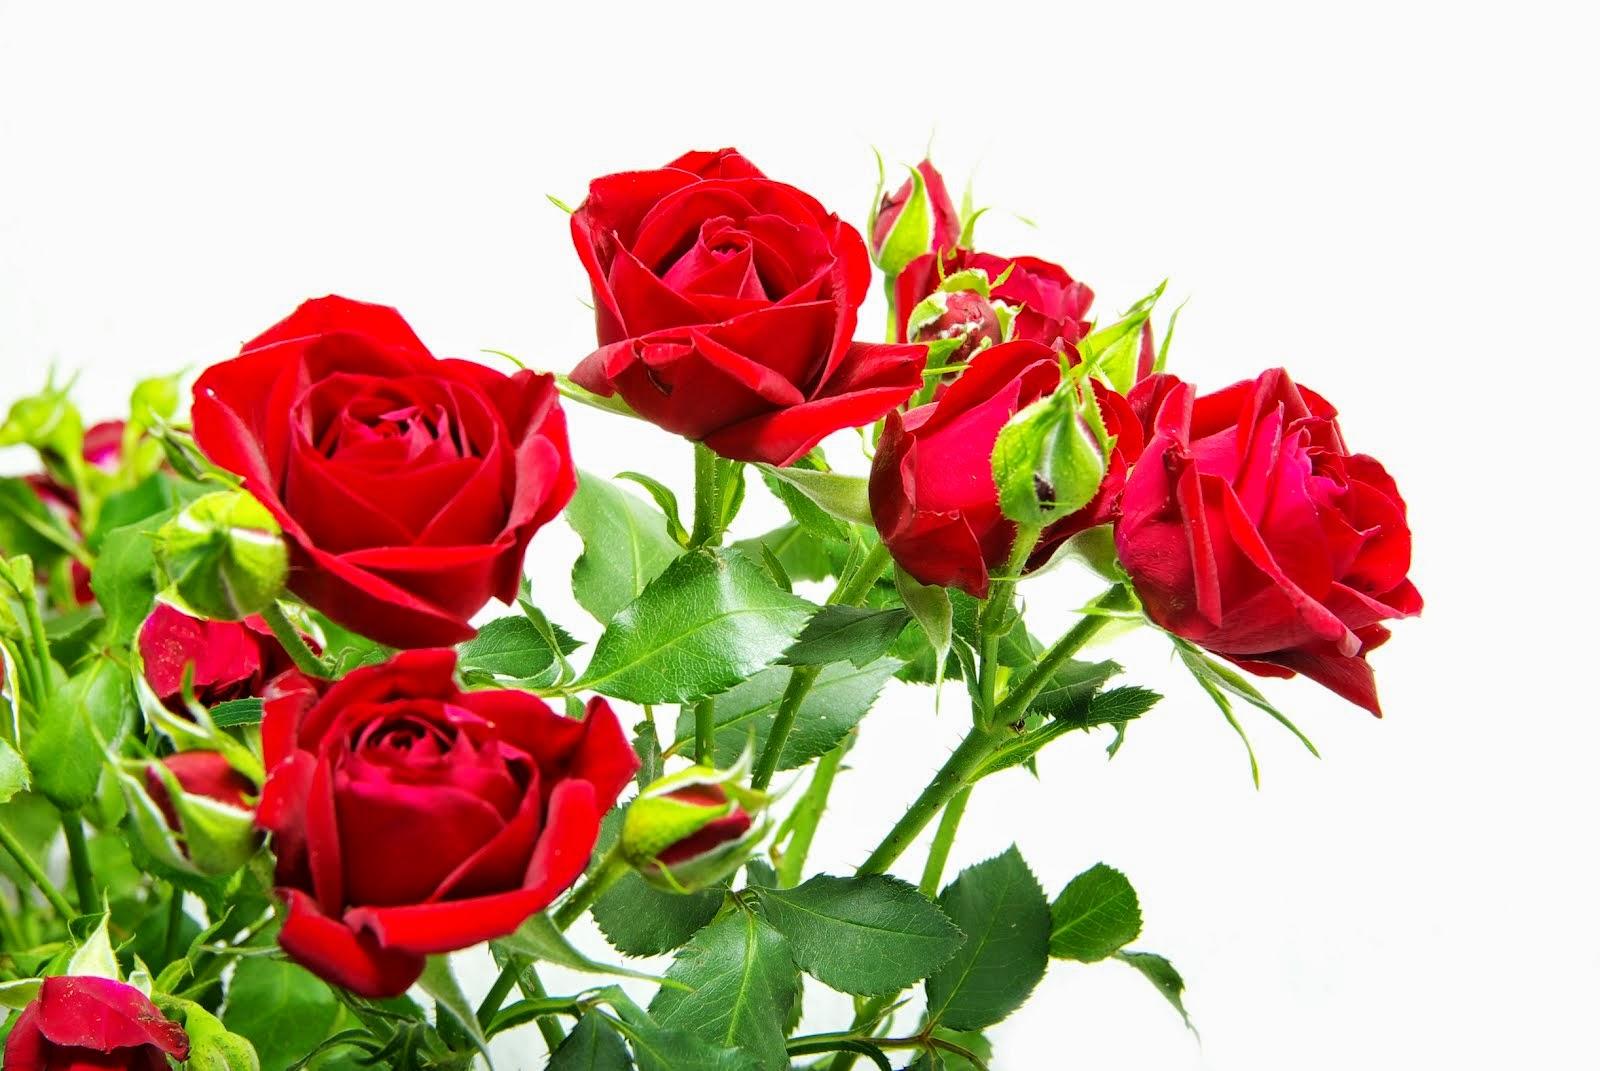 Flores Rojas, parte 3